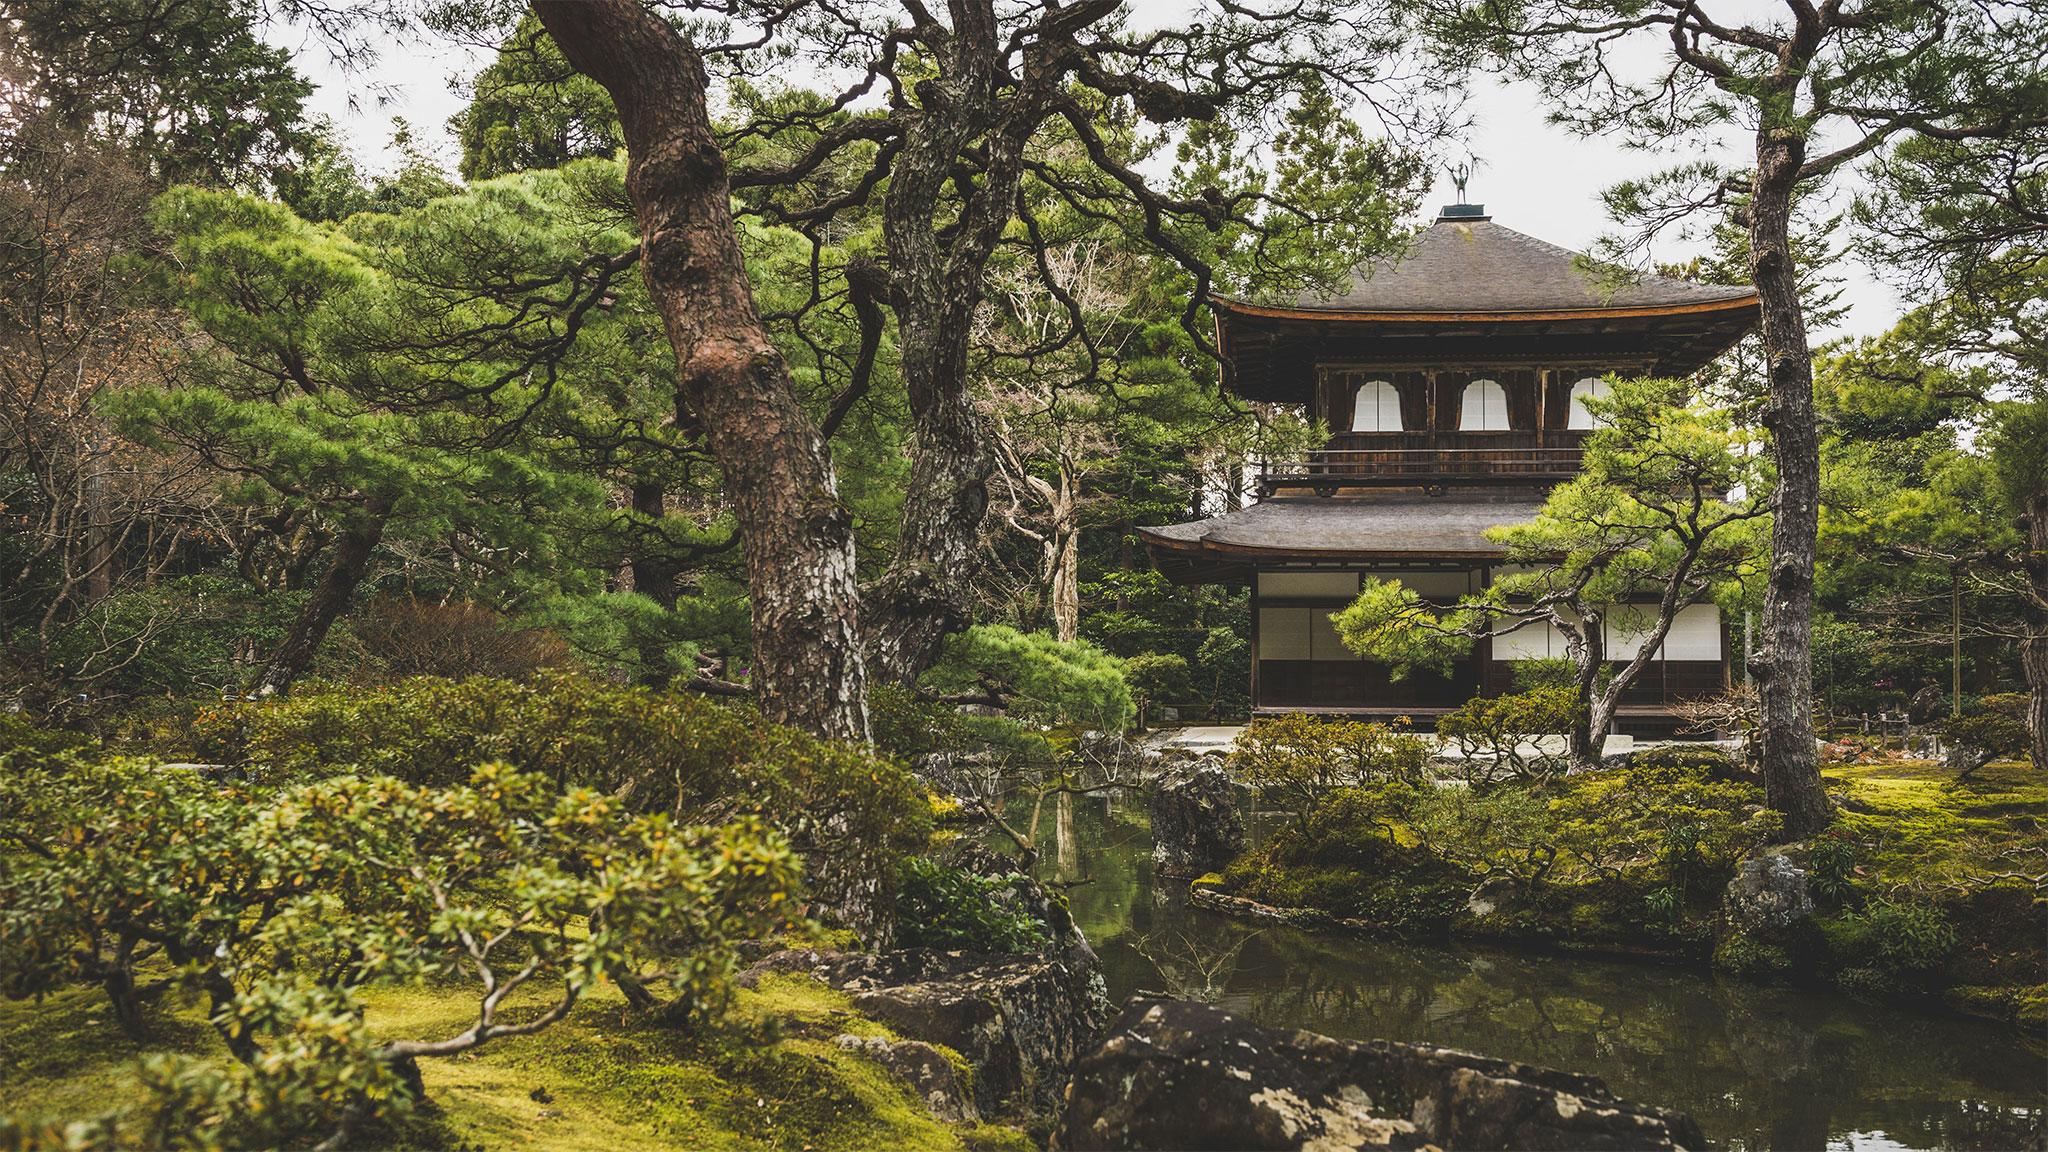 Japanese garden design bows to the moon | Financial Times